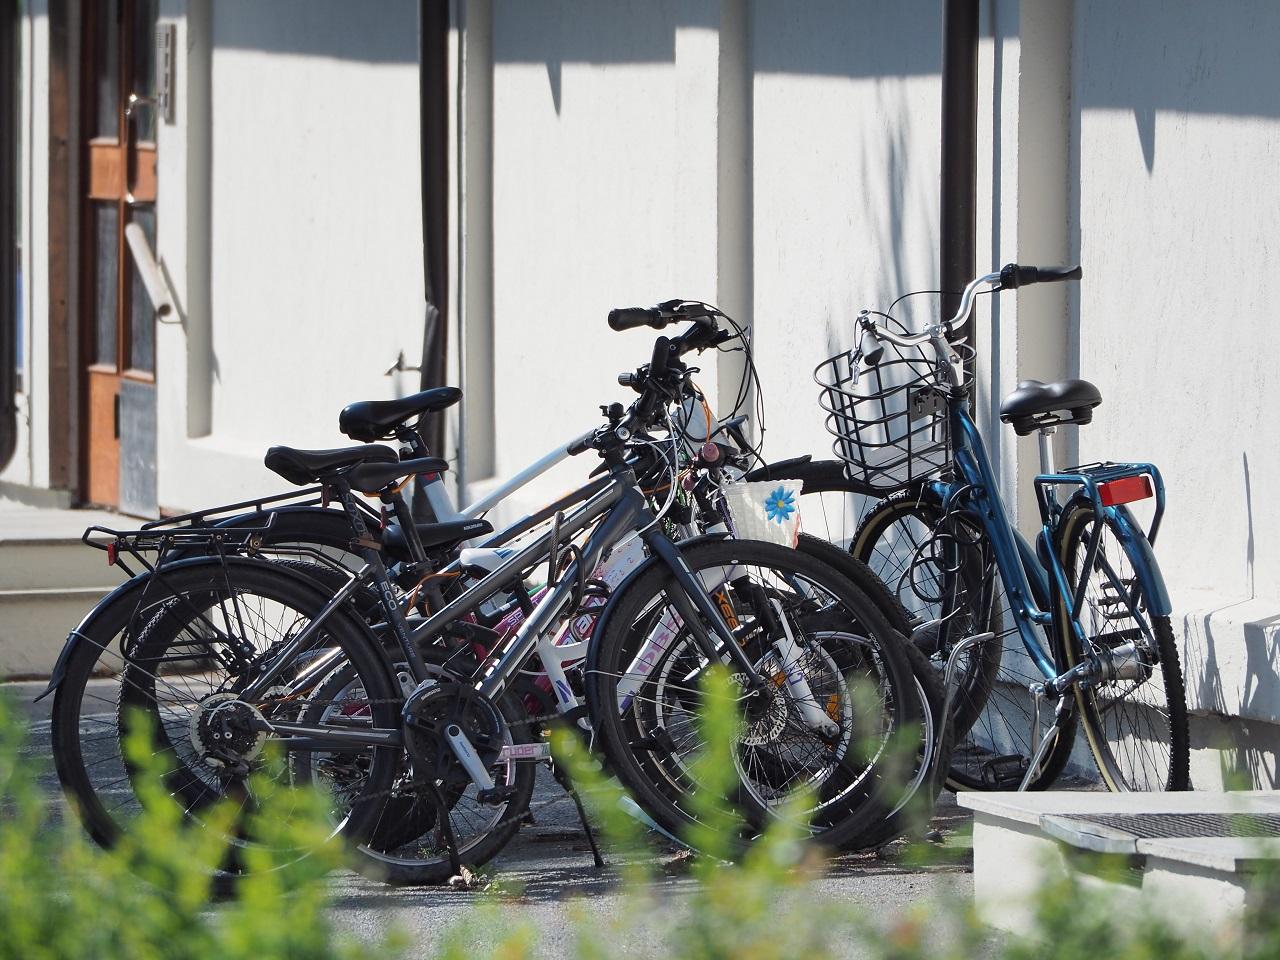 Sykkeltyverier - sykler - parkering - If forsikring